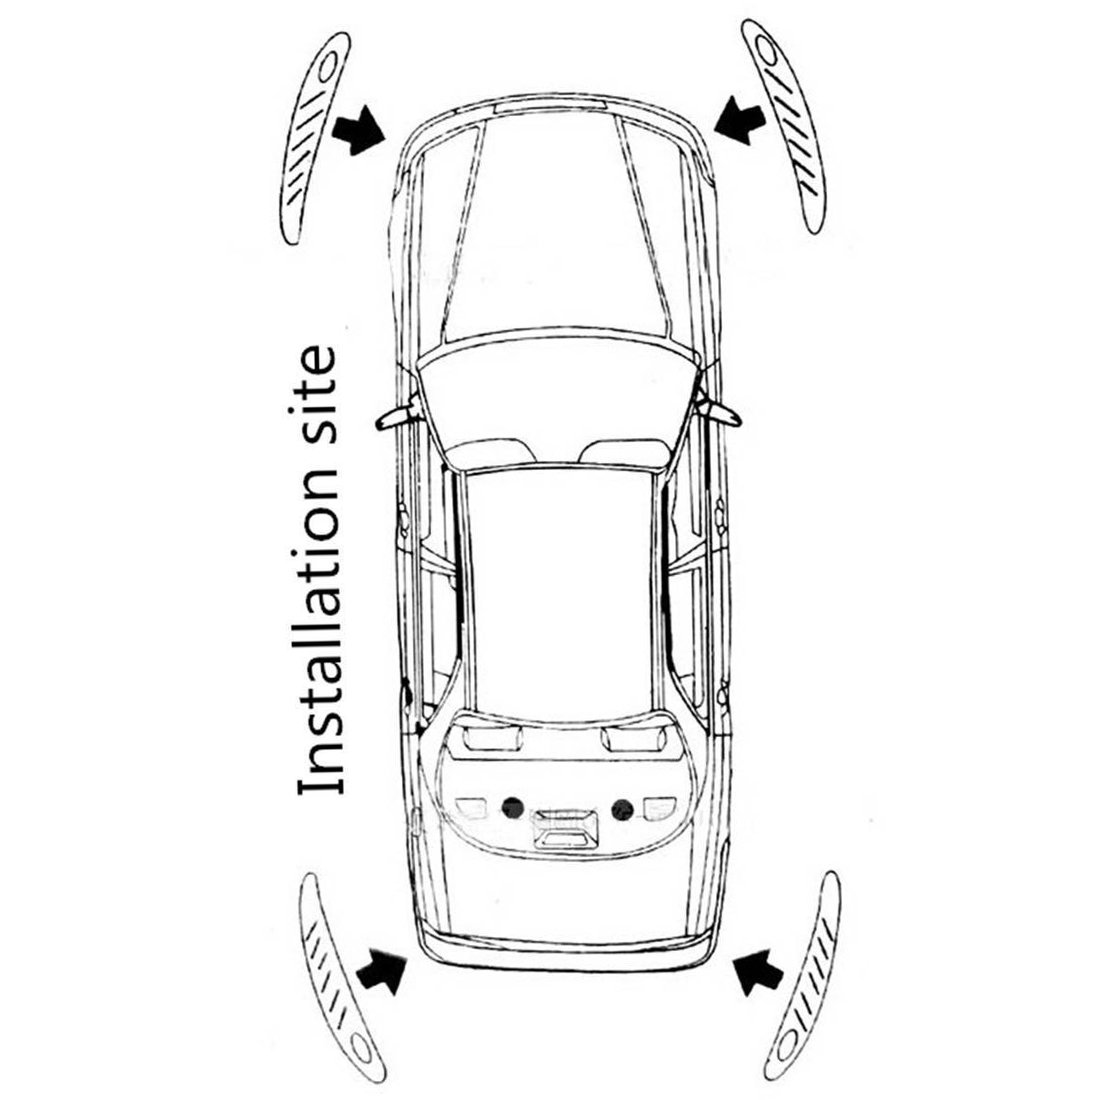 ZYHW 4 Pcs Black Auto Car Body Bumper Guard Protector Sticker Bar Strip ZHY20170222107